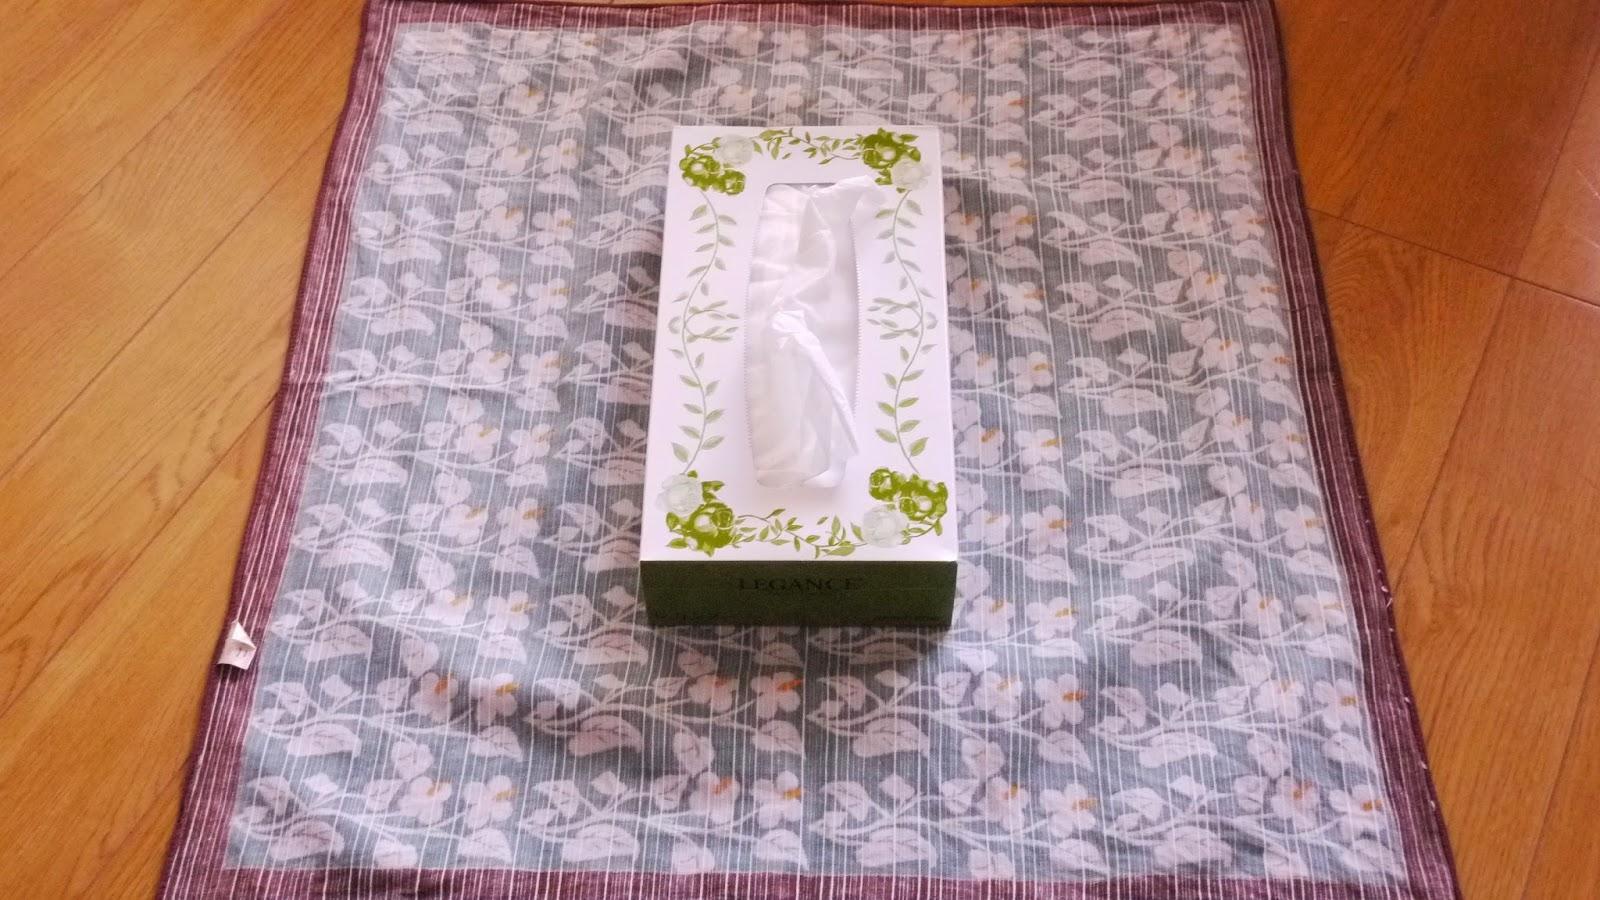 【日本禮法】使用風呂敷裝飾「面紙盒」(ティッシュ包み) @ MIYABI日本傳統文化